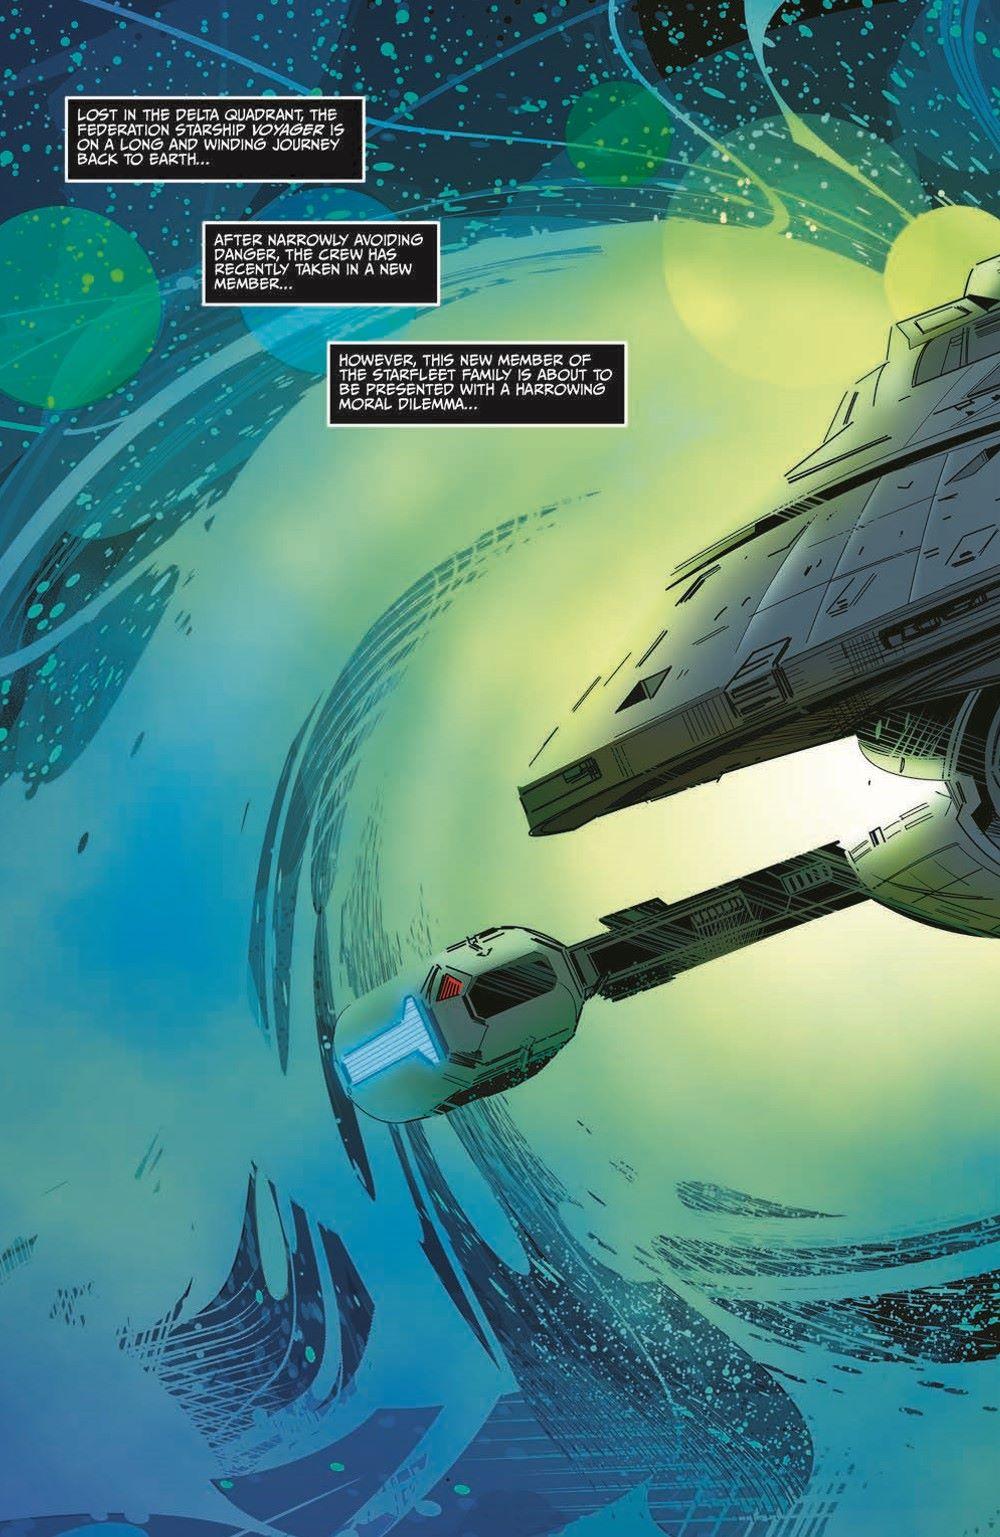 ST_Voyager_SR01-pr-4 ComicList Previews: STAR TREK VOYAGER SEVEN'S RECKONING #1 (OF 4)